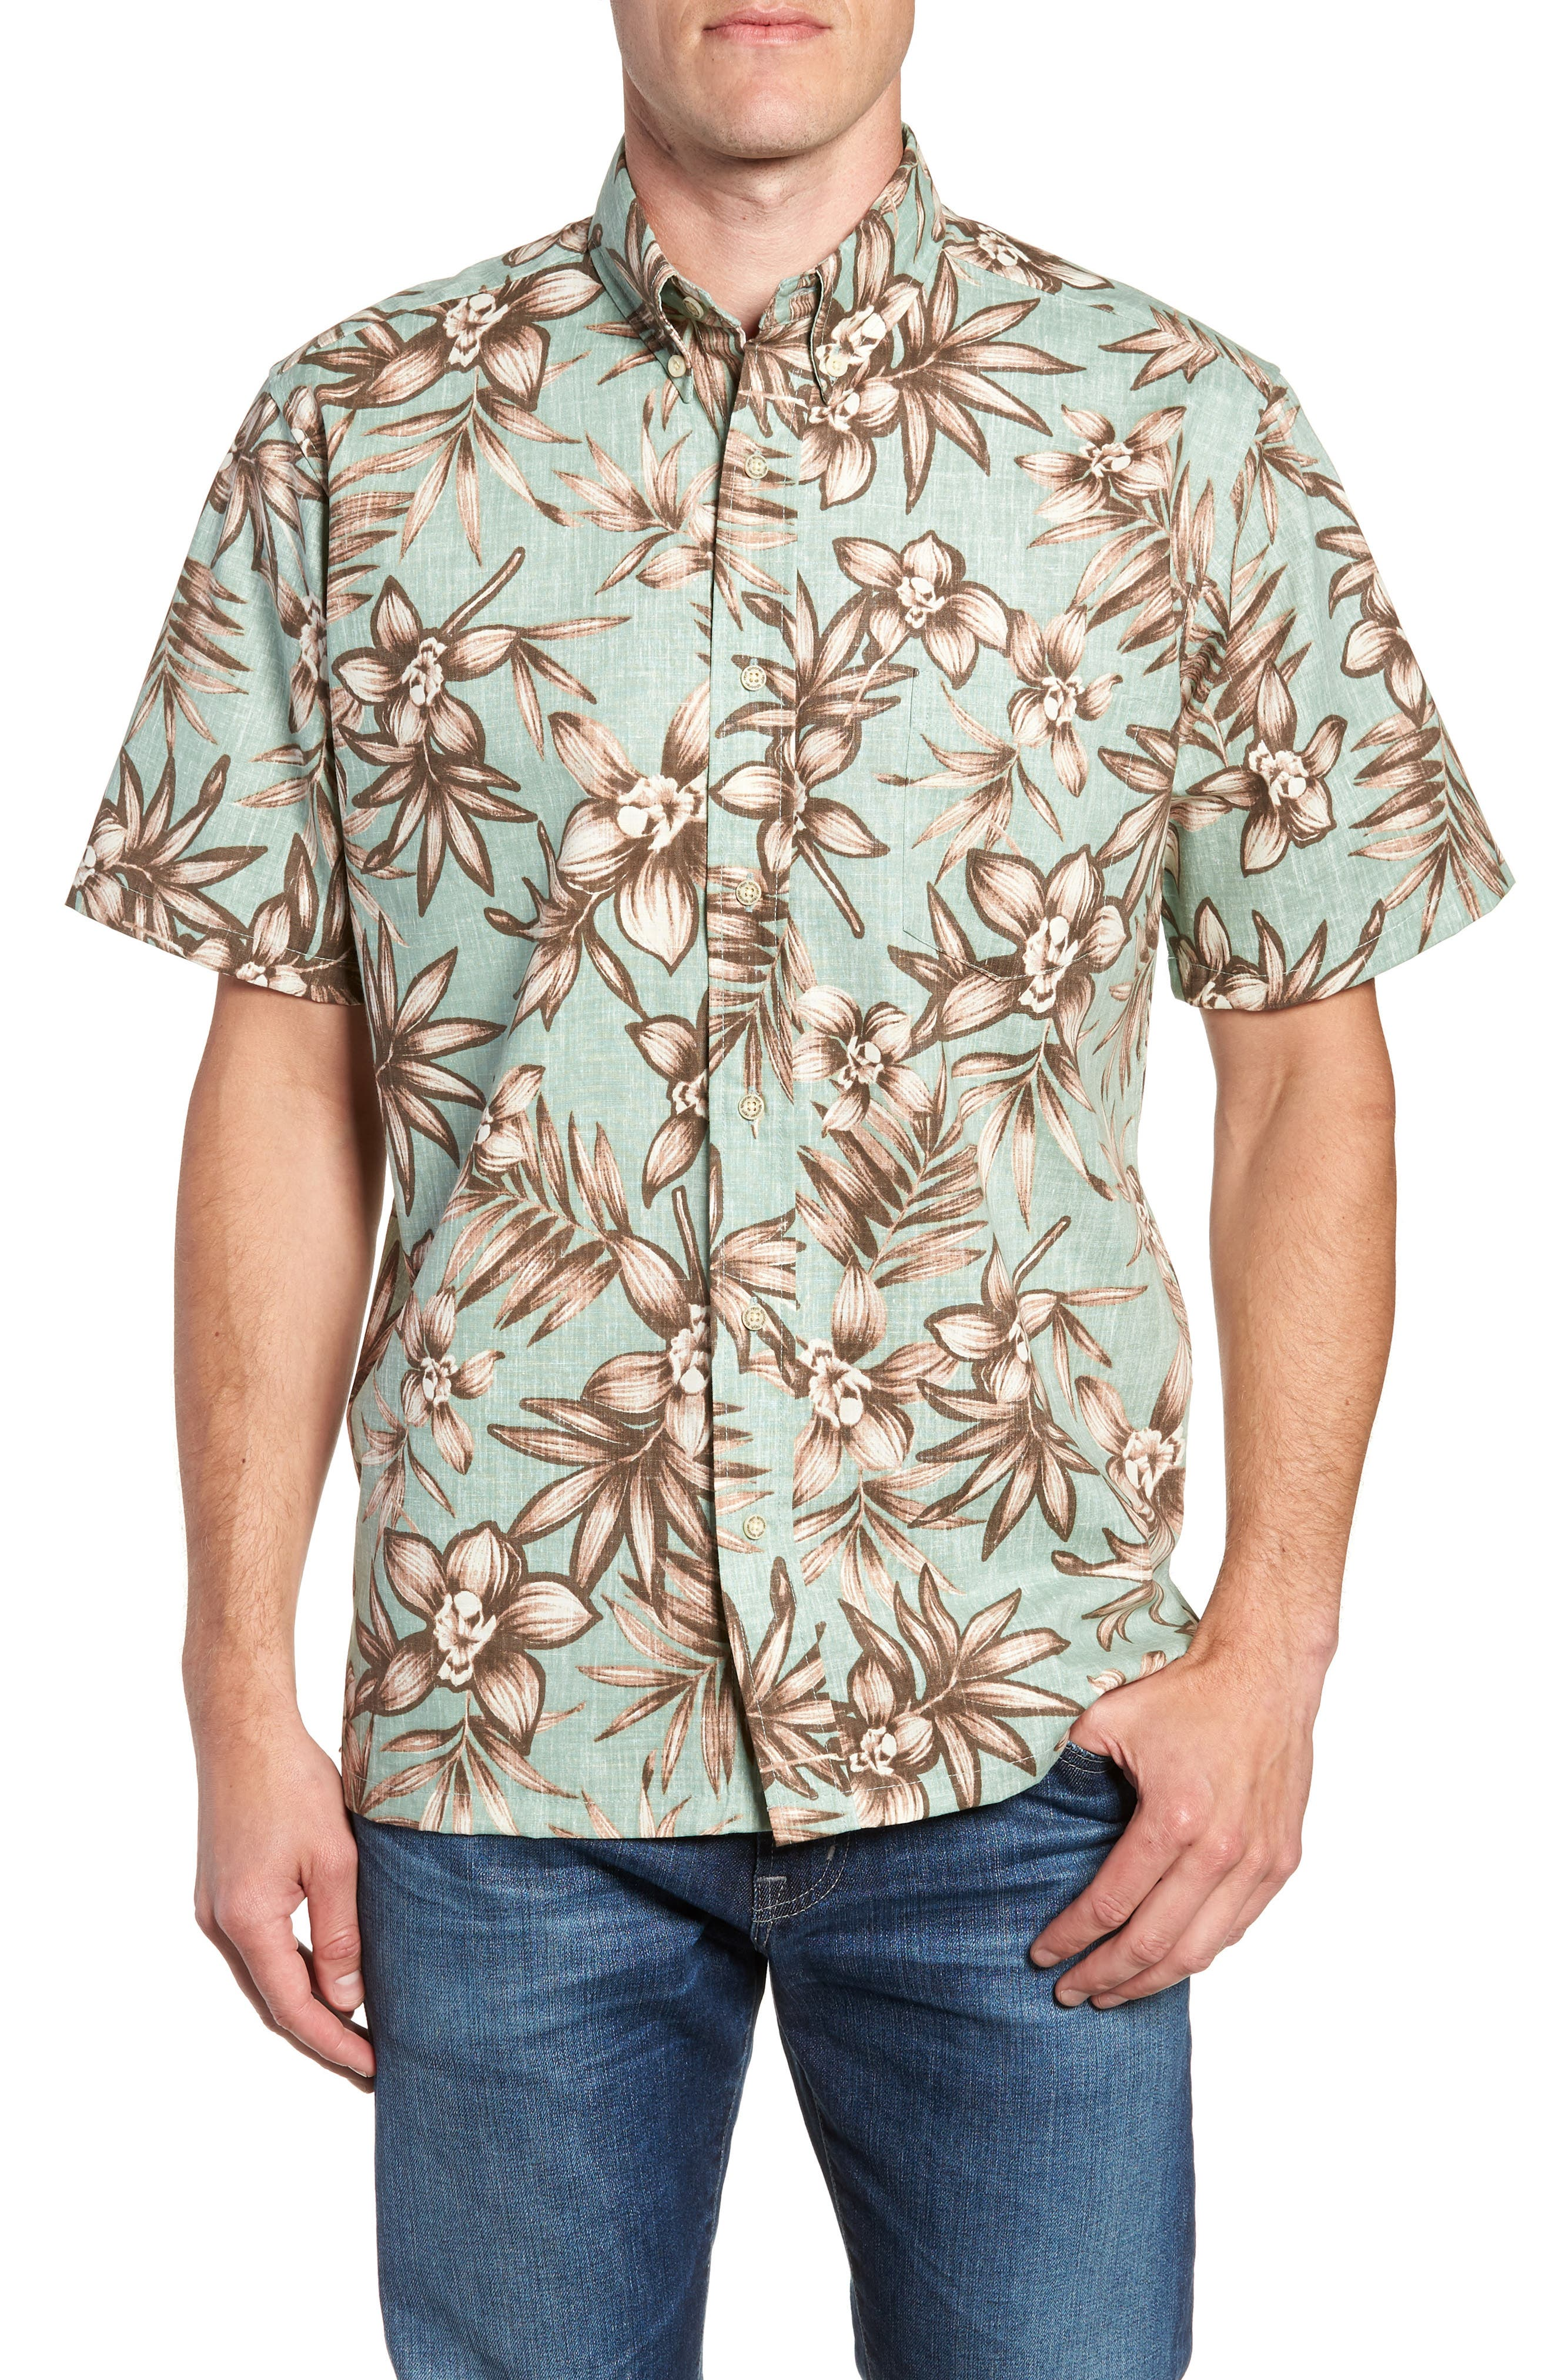 Onishi Garden Regular Fit Sport Shirt,                         Main,                         color, Seafoam